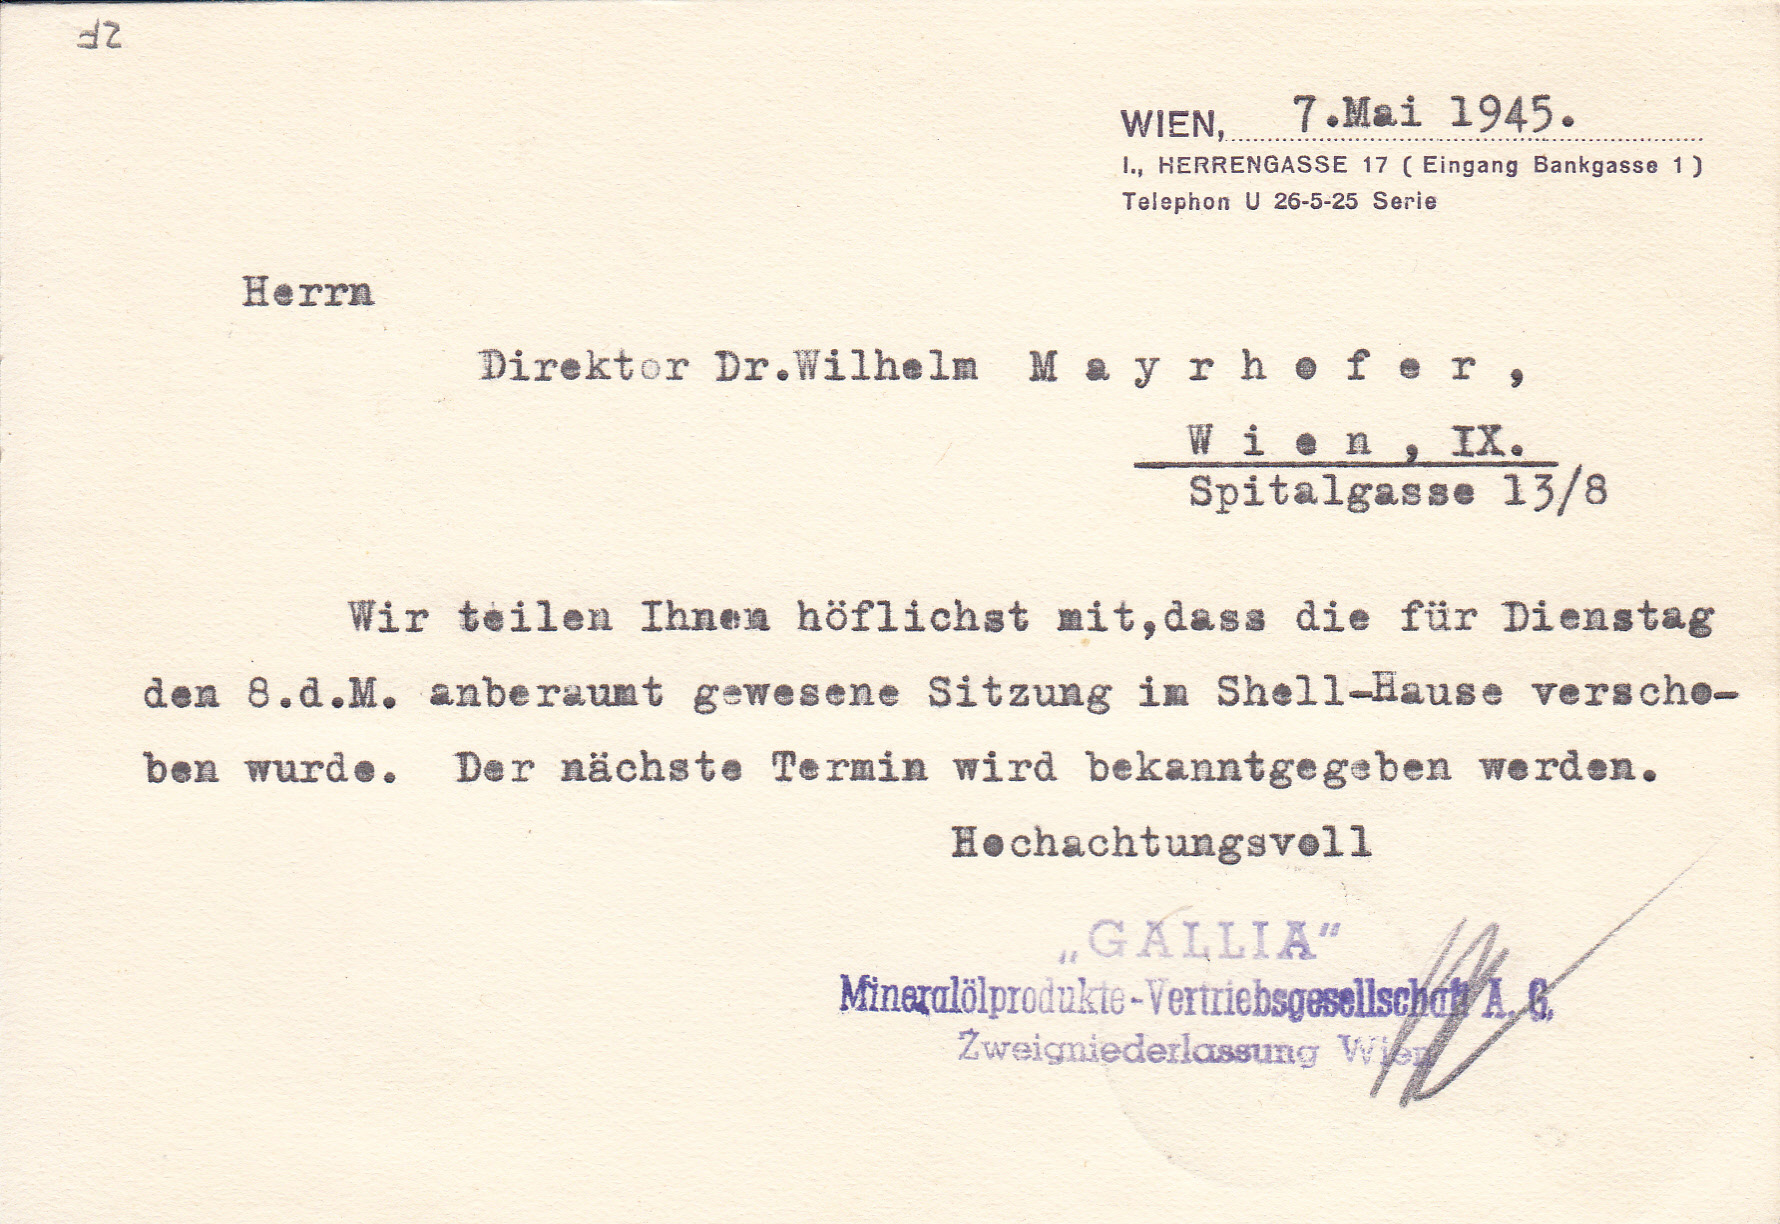 Notstempel Österreichs 1945 - 1946 Img_0255